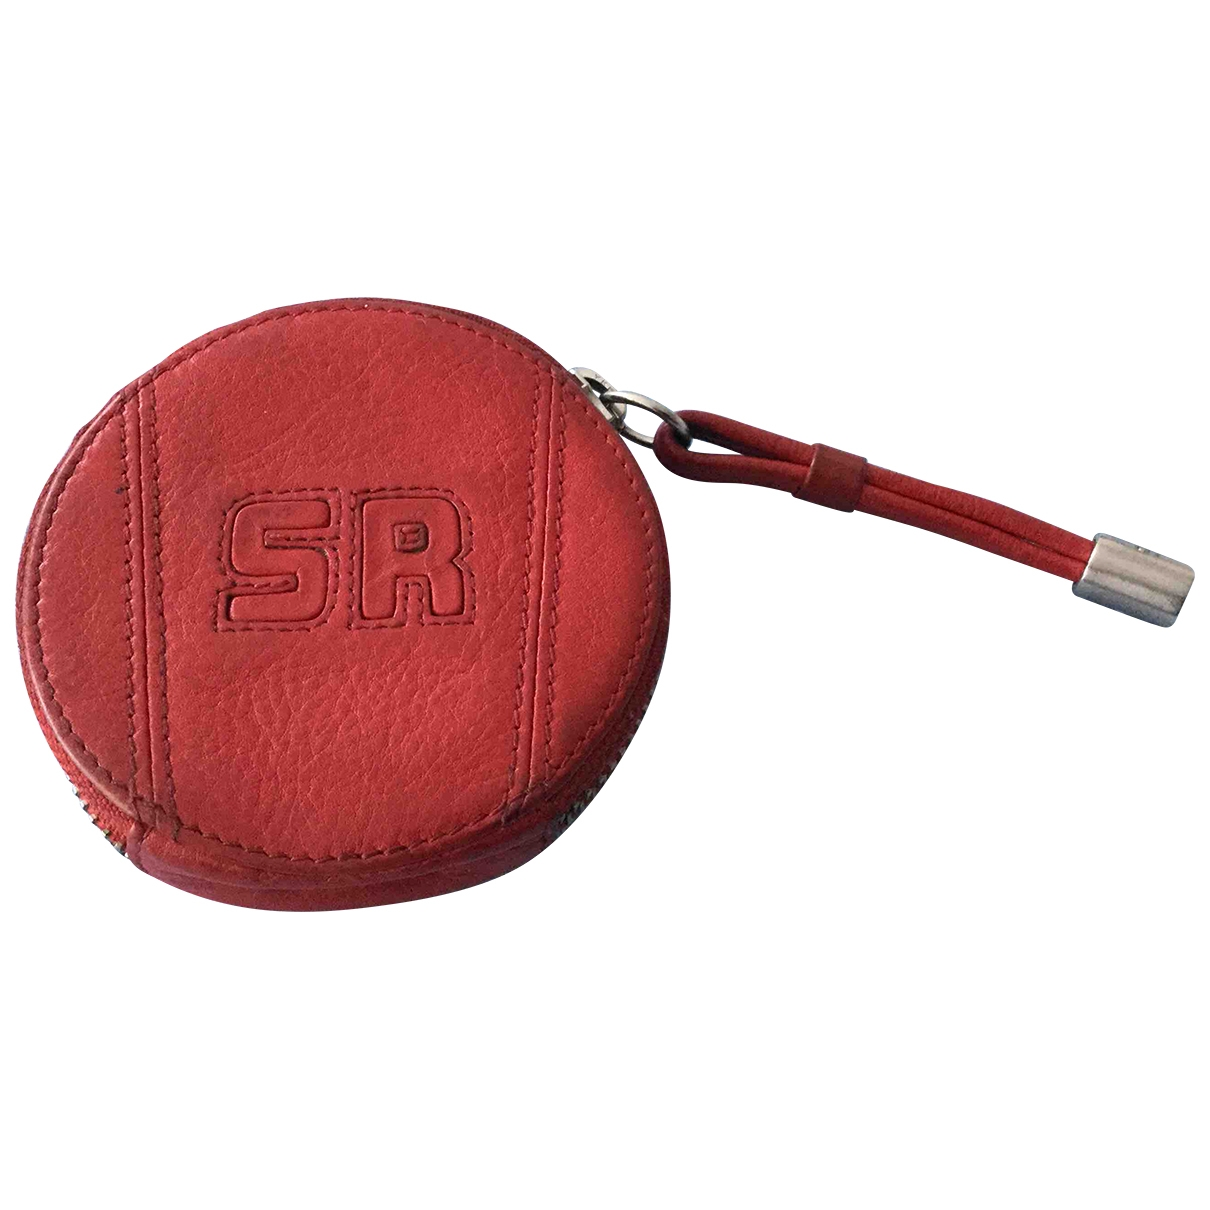 Sonia Rykiel \N Red Leather Purses, wallet & cases for Women \N